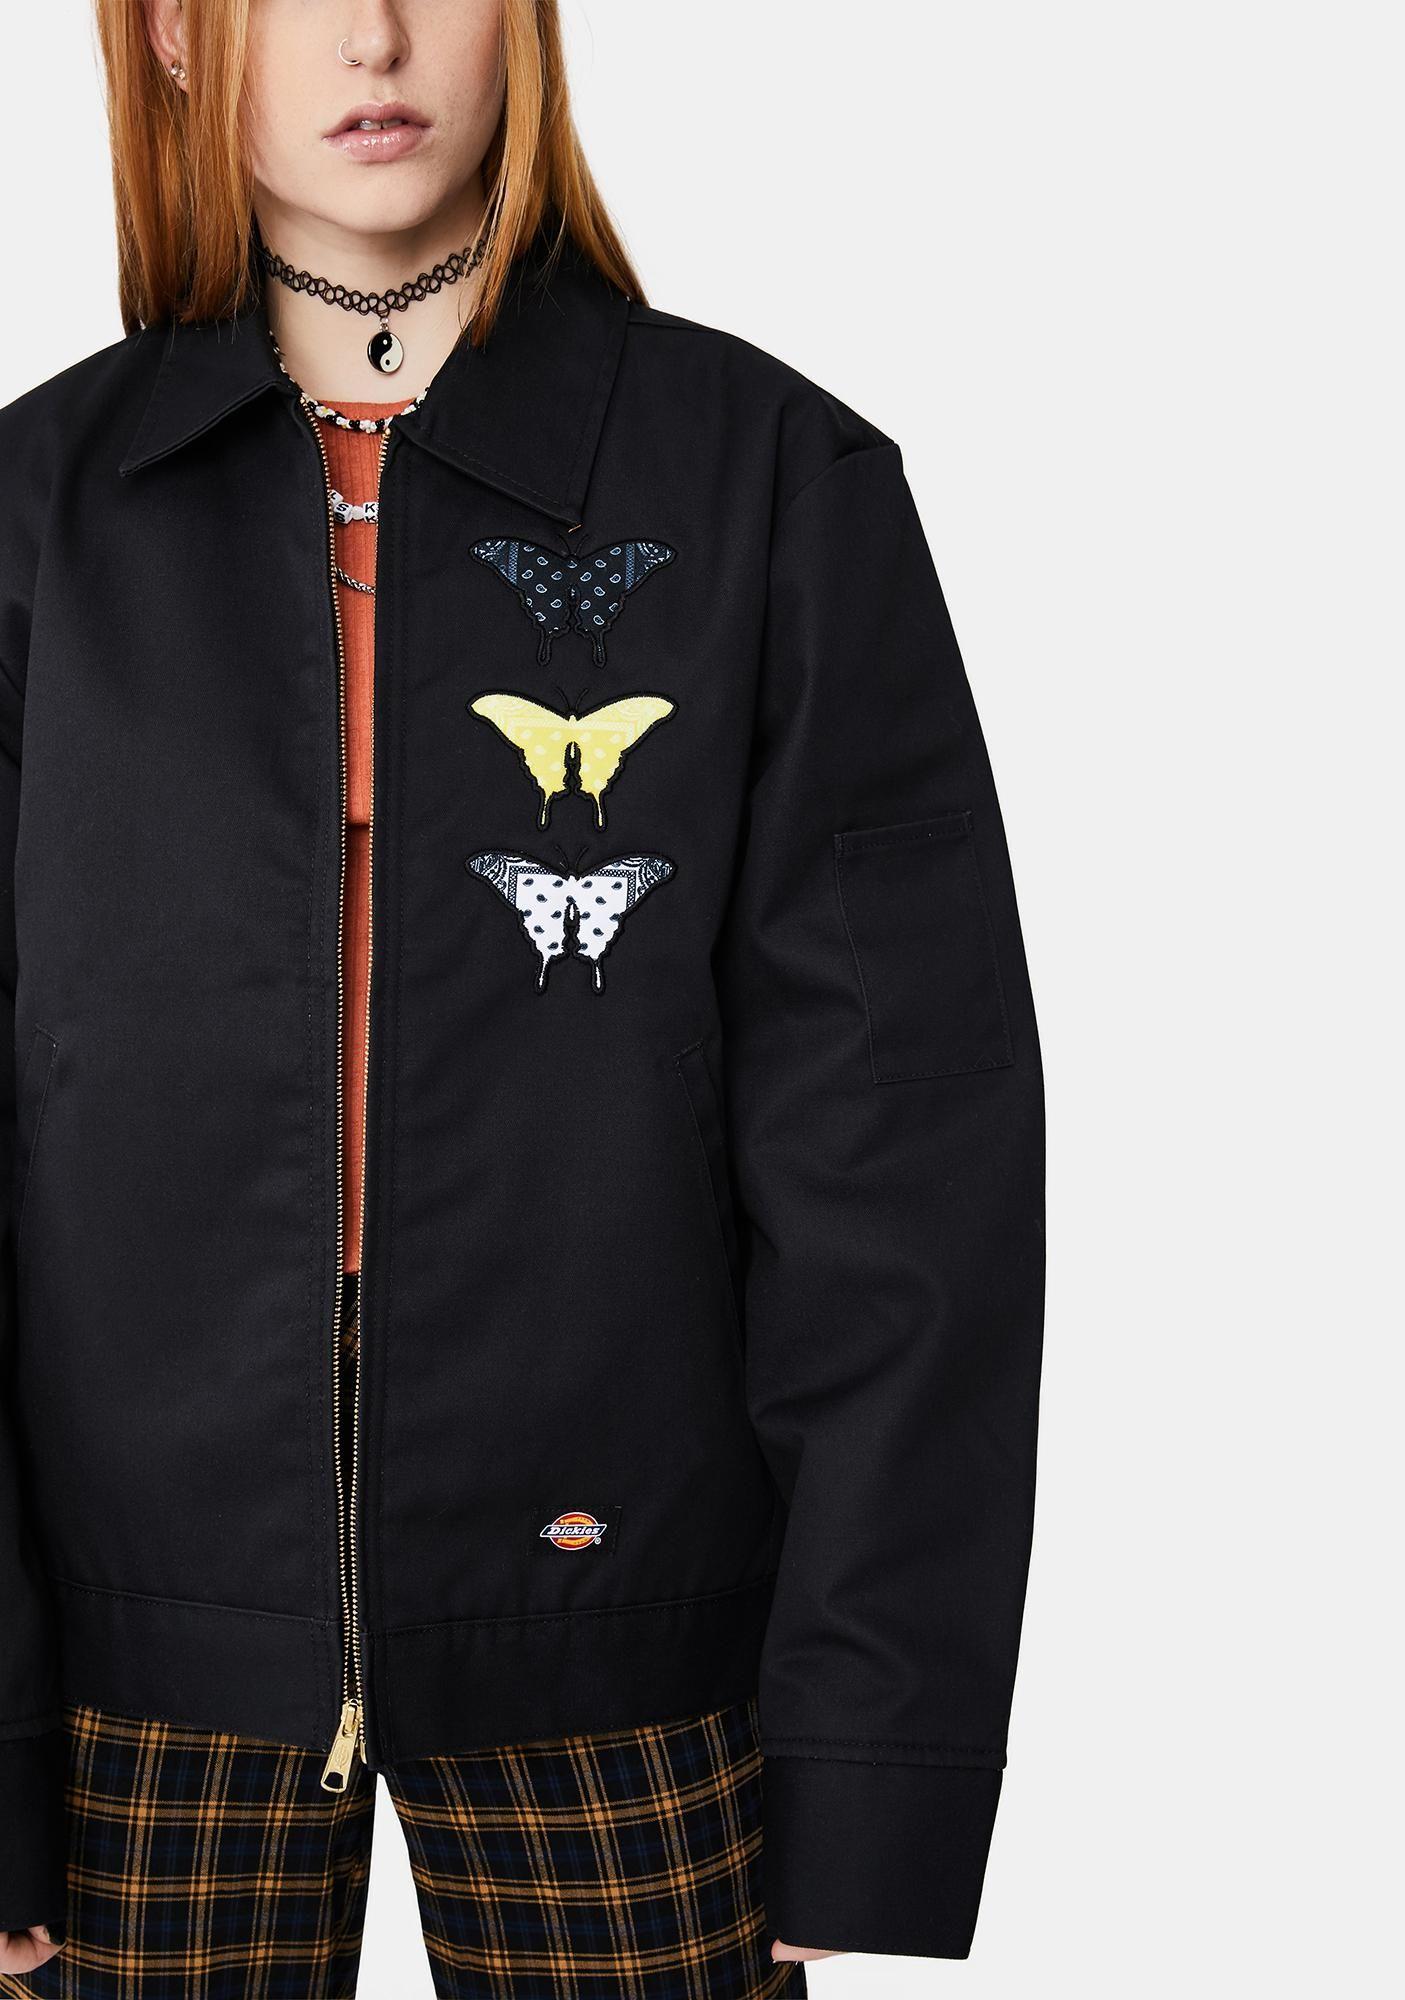 Bandana Butterfly Eisenhower Bomber Jacket Bomber Jacket Black Bomber Jacket Jackets [ 2000 x 1405 Pixel ]